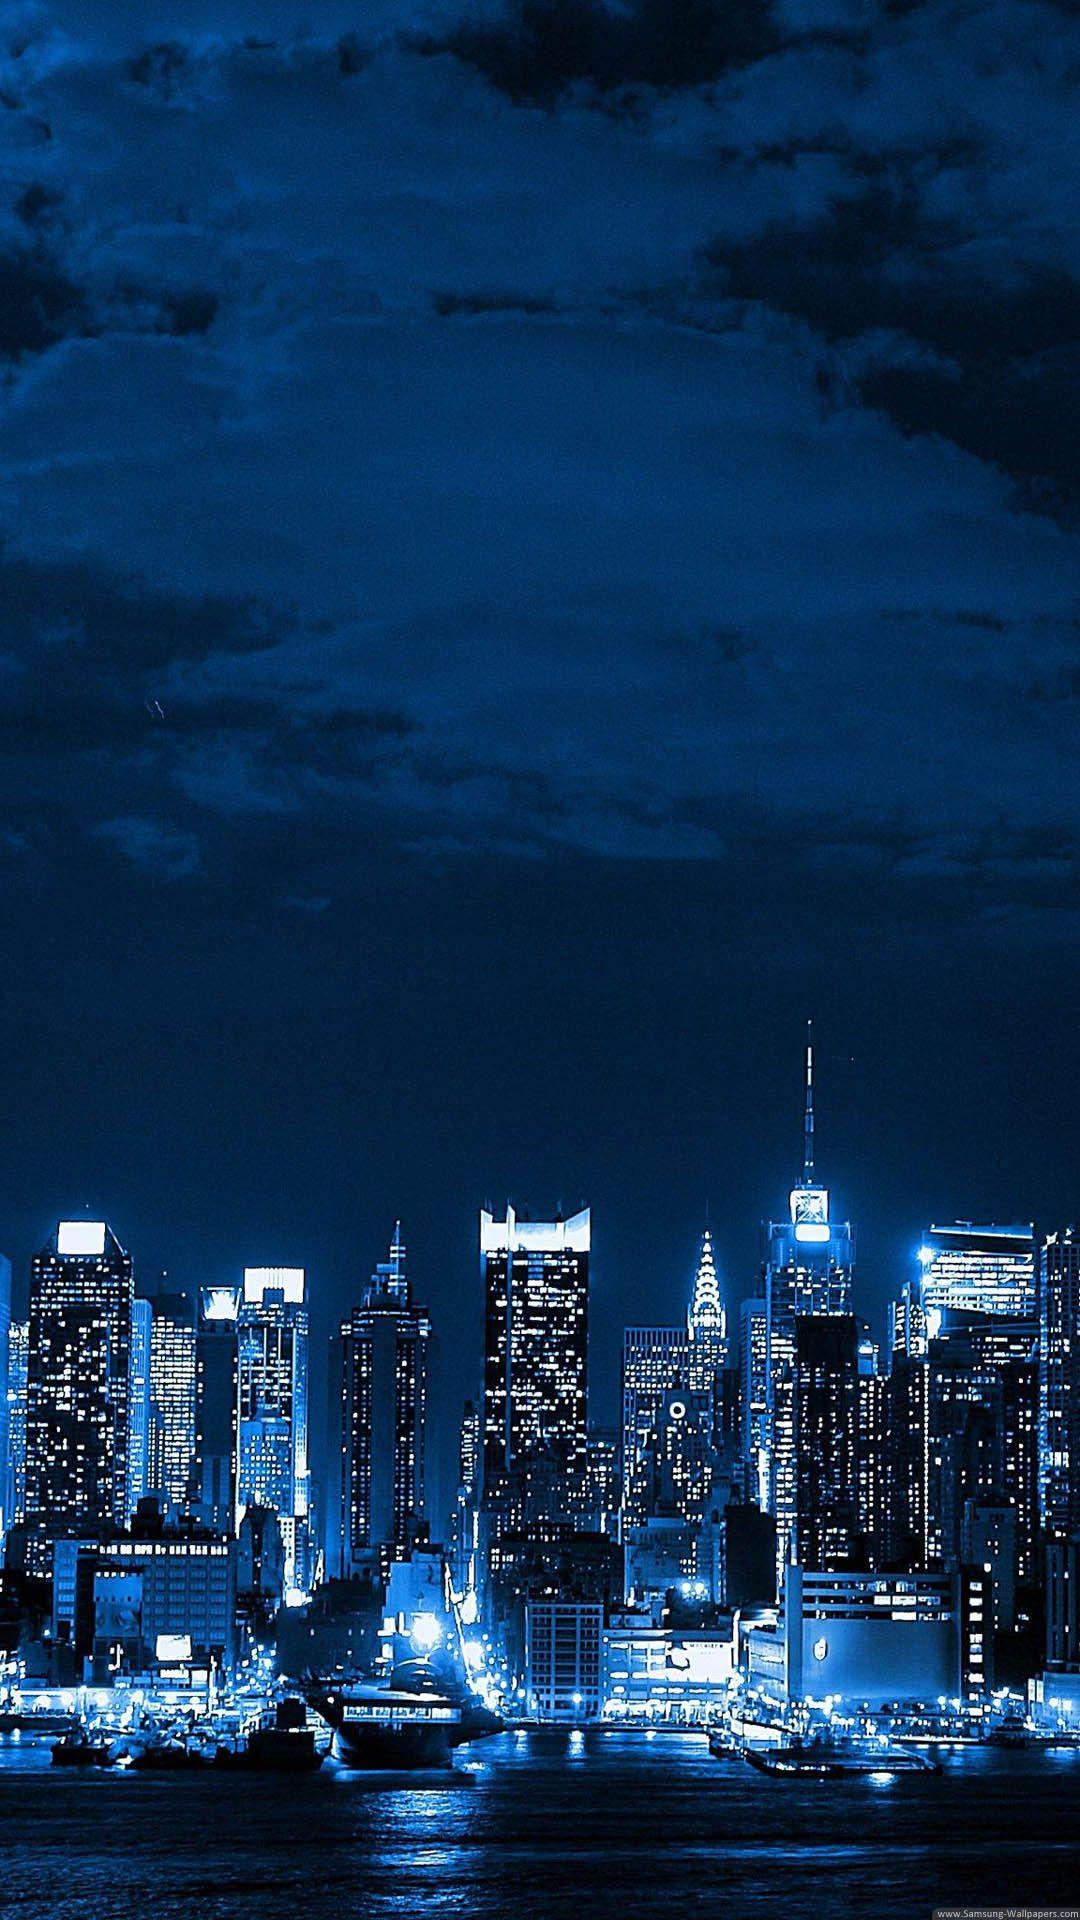 Metropolis Big City Night Skyline Iphone 6 Plus Hd Wallpaper